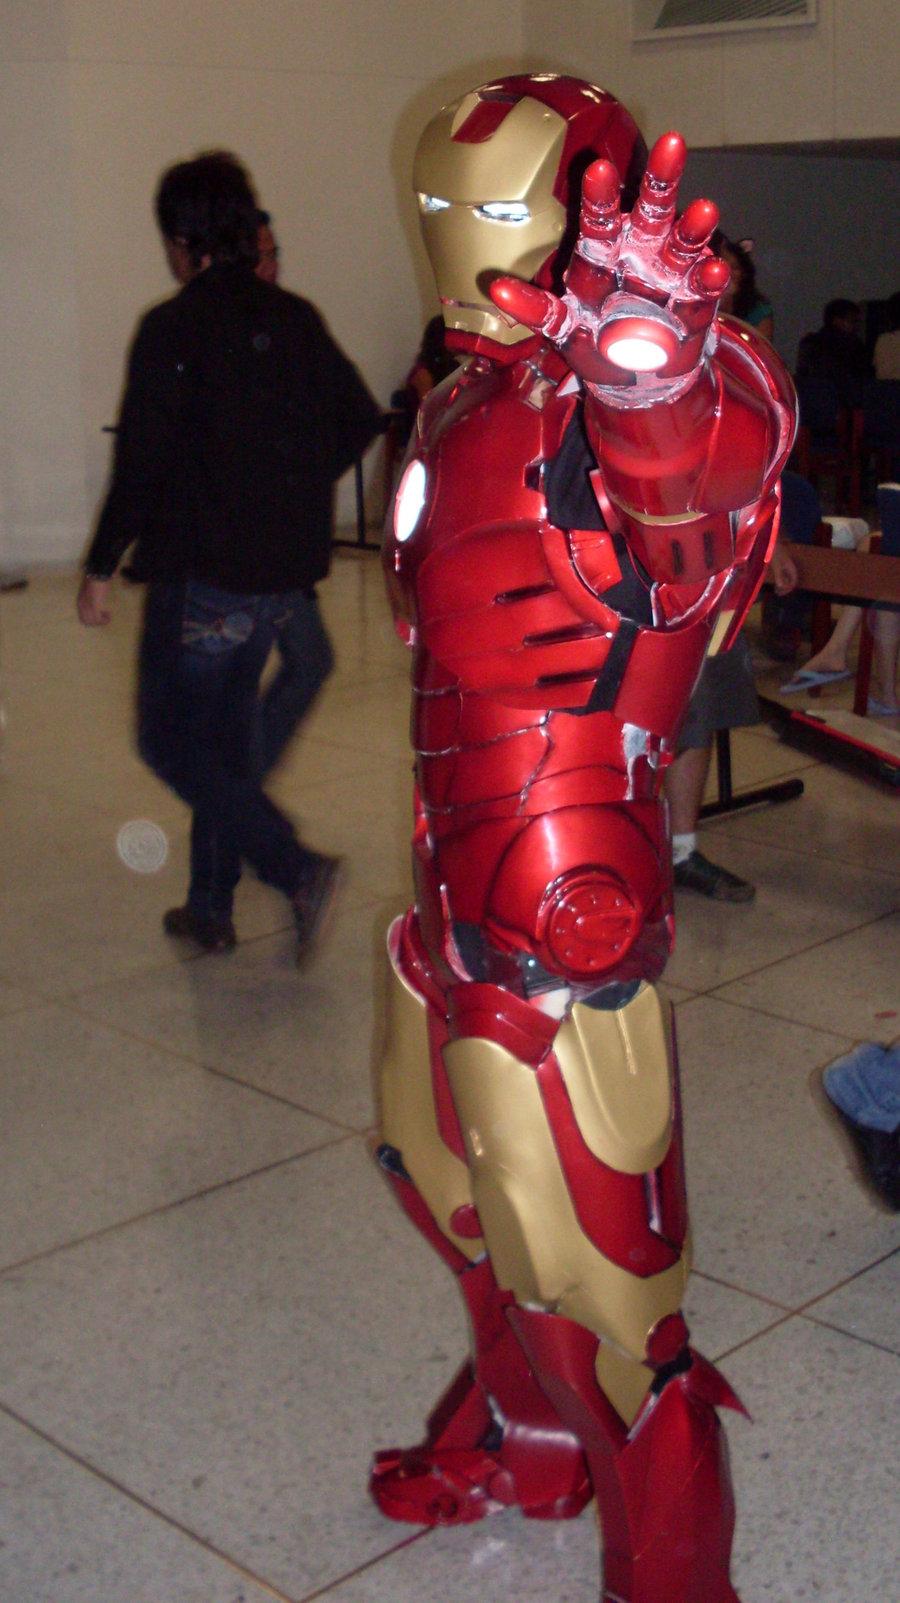 Iron Man Cosplay 1 by SHIZUKE1984